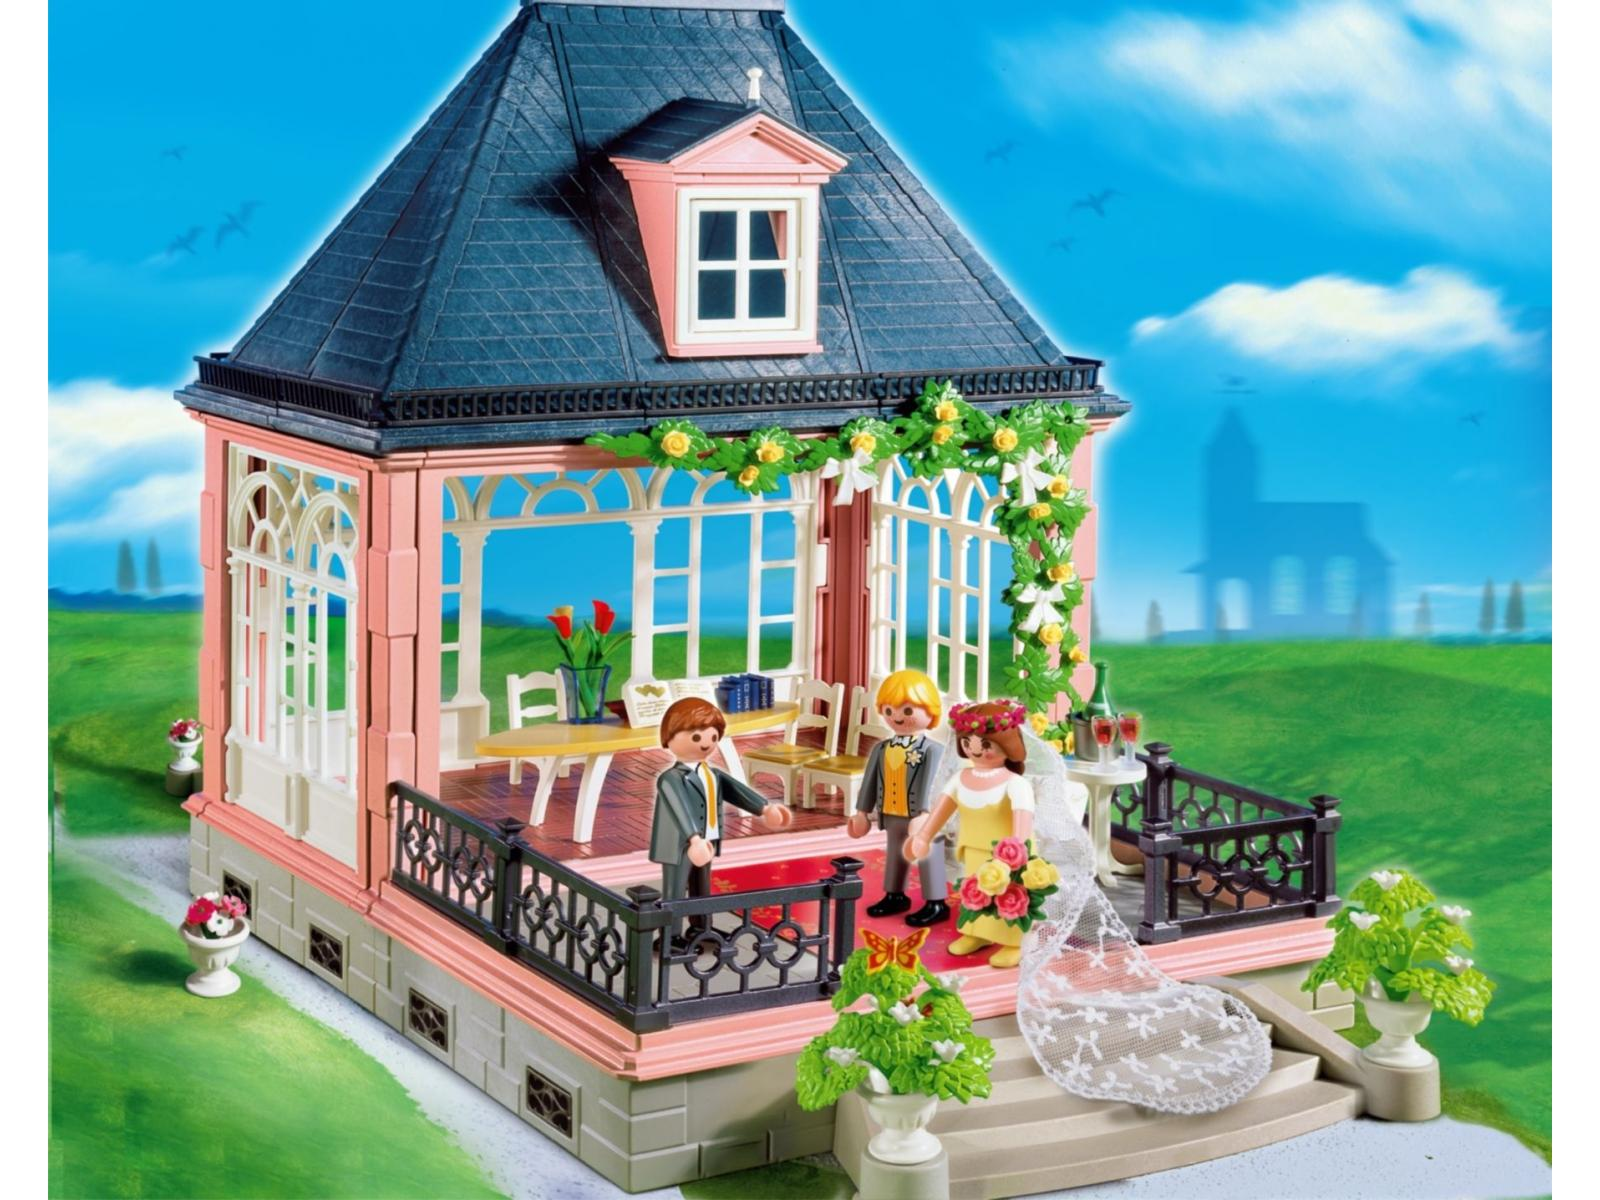 Playmobil mari s et salle de r ception 4297 for Salle a manger playmobil city life